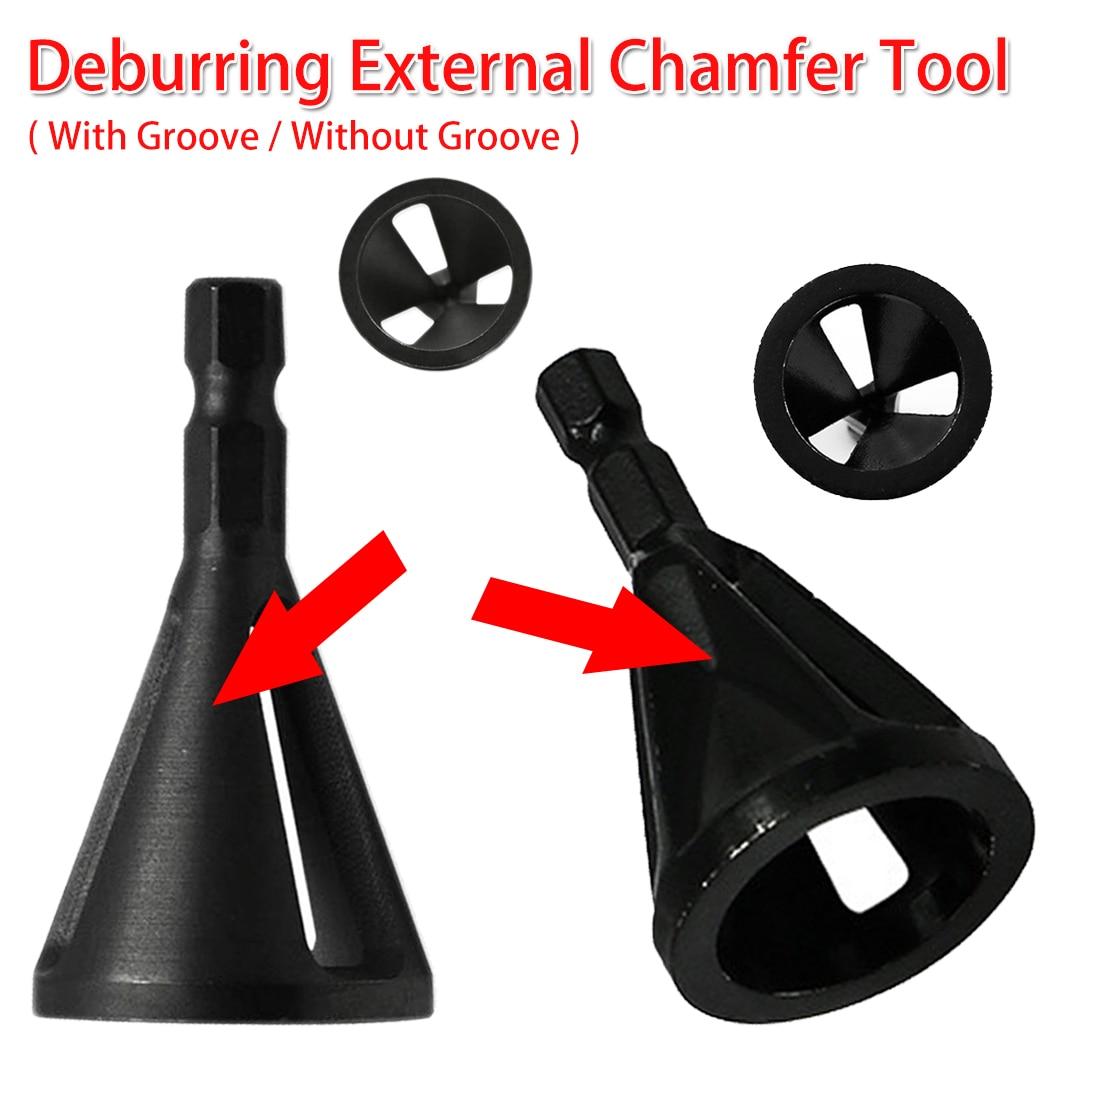 Steel Deburring External Chamfer Tool Drill Bit Remove Burr Tire Repair Damaged Bolts Woodworking 1/4 Shank 4-19mm Work Range